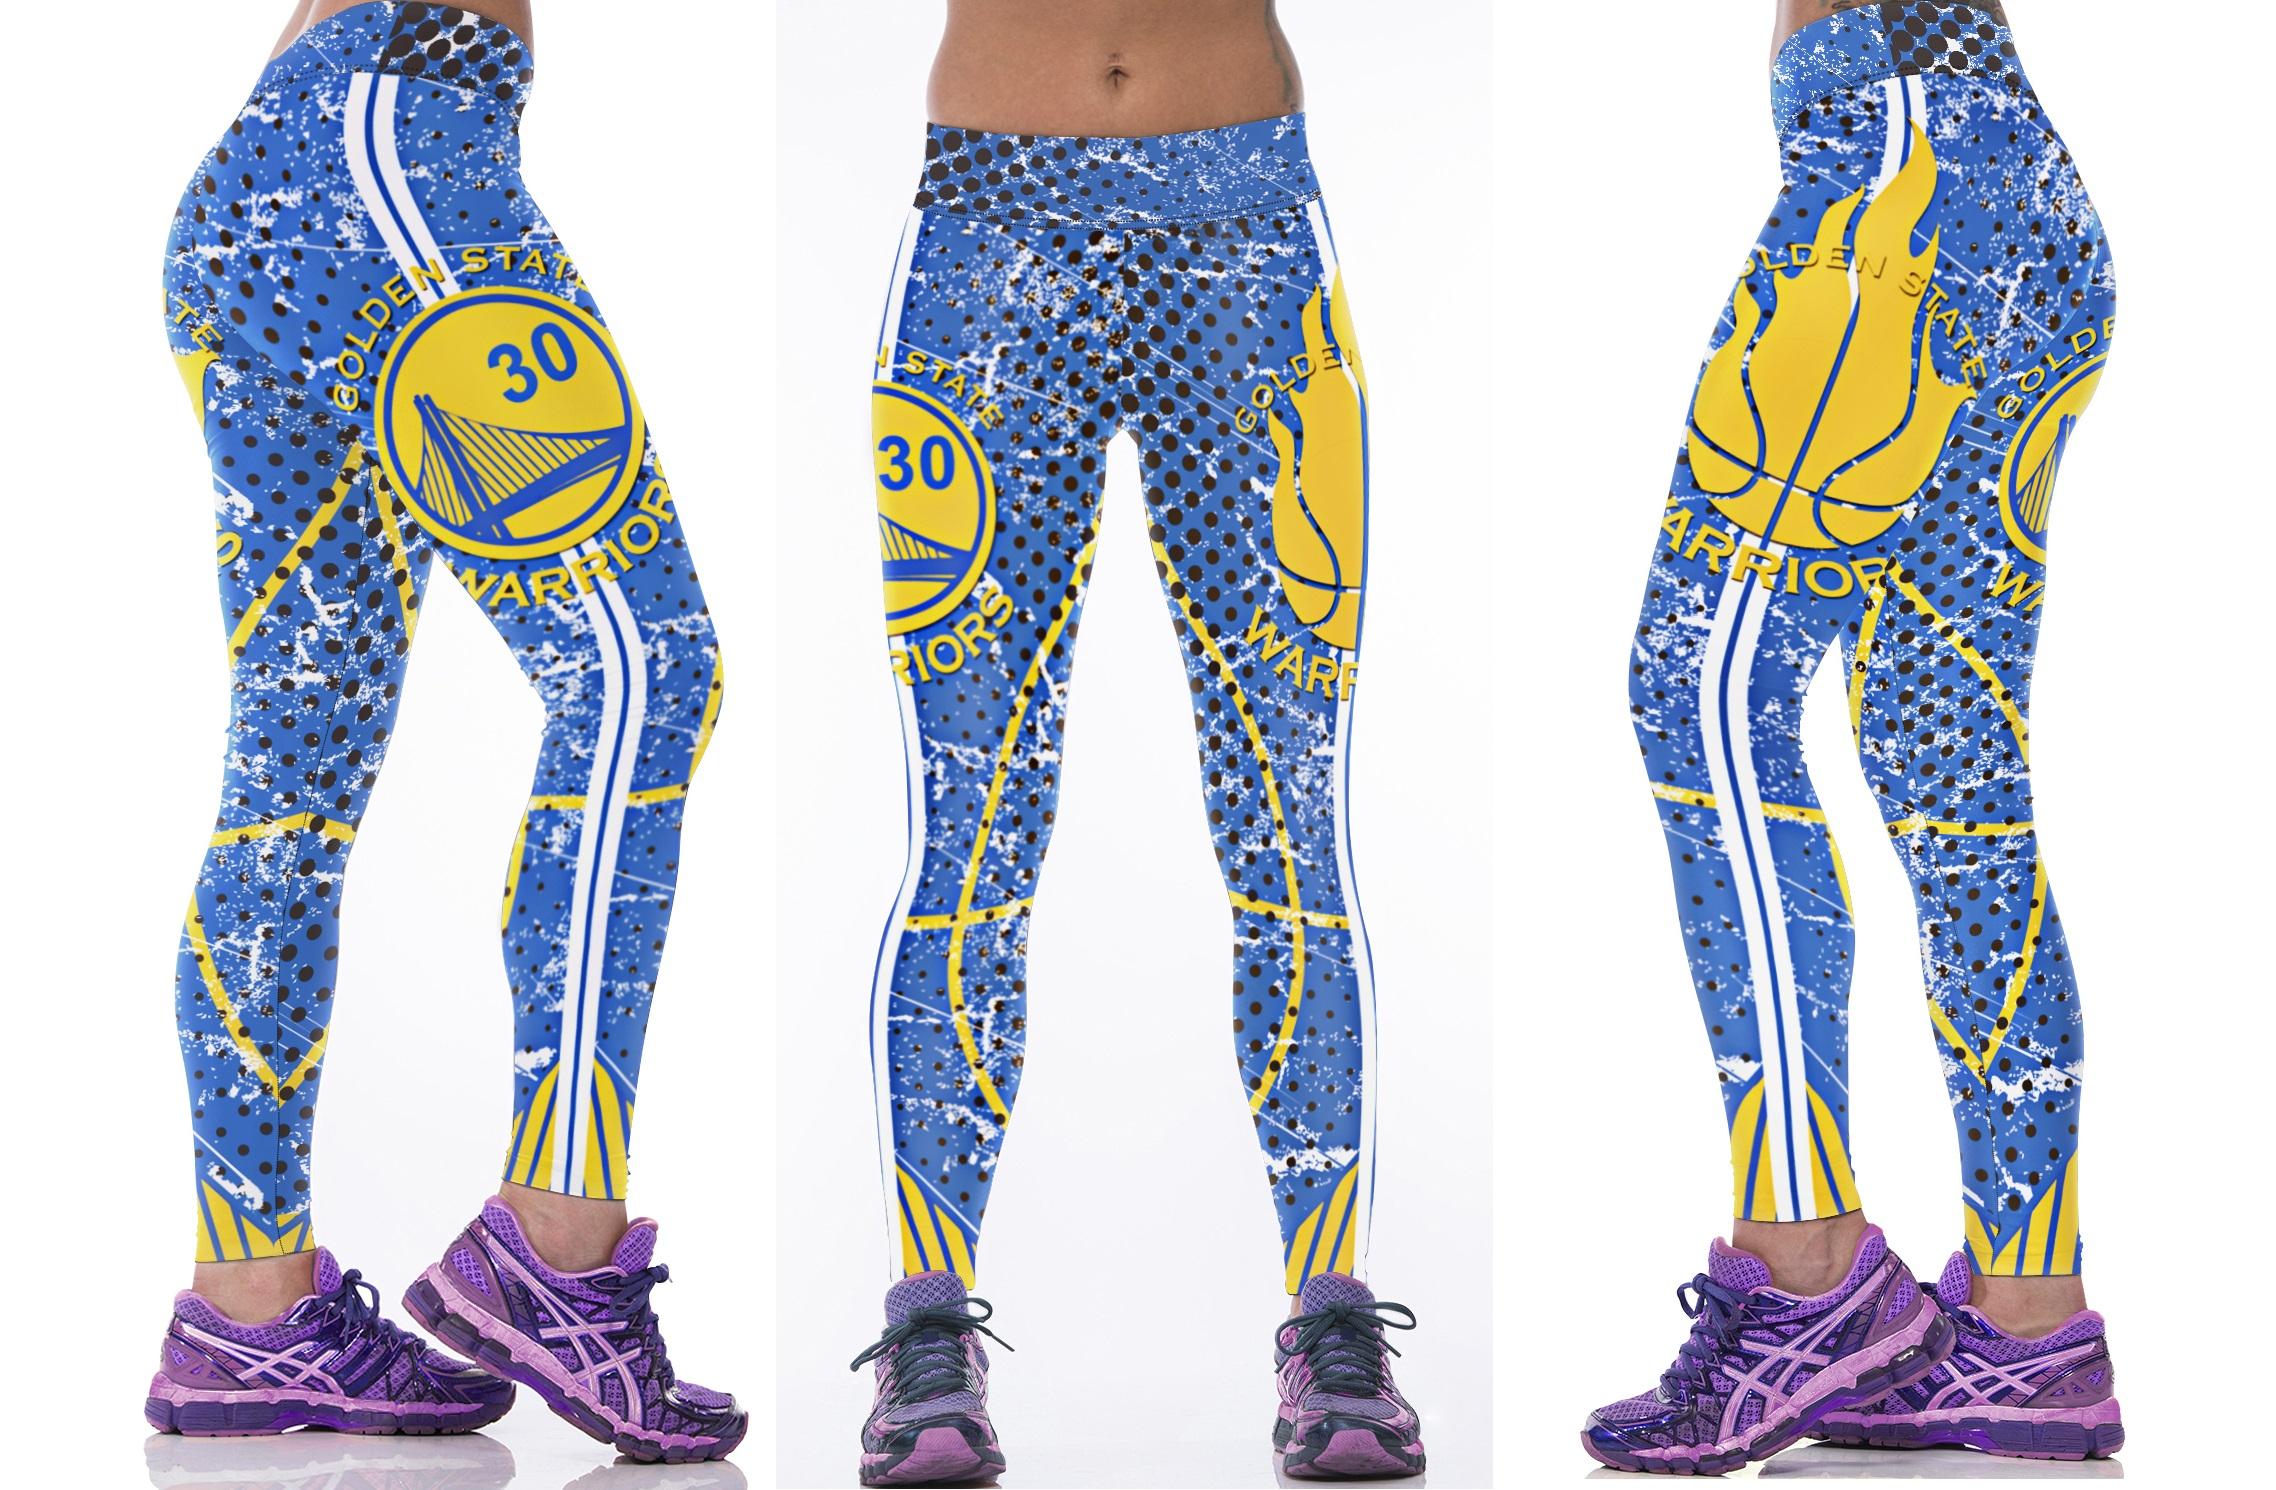 8f8a4bd3 New Golden State Warriors NBA Women Leggings Fitness Sports Gym ...